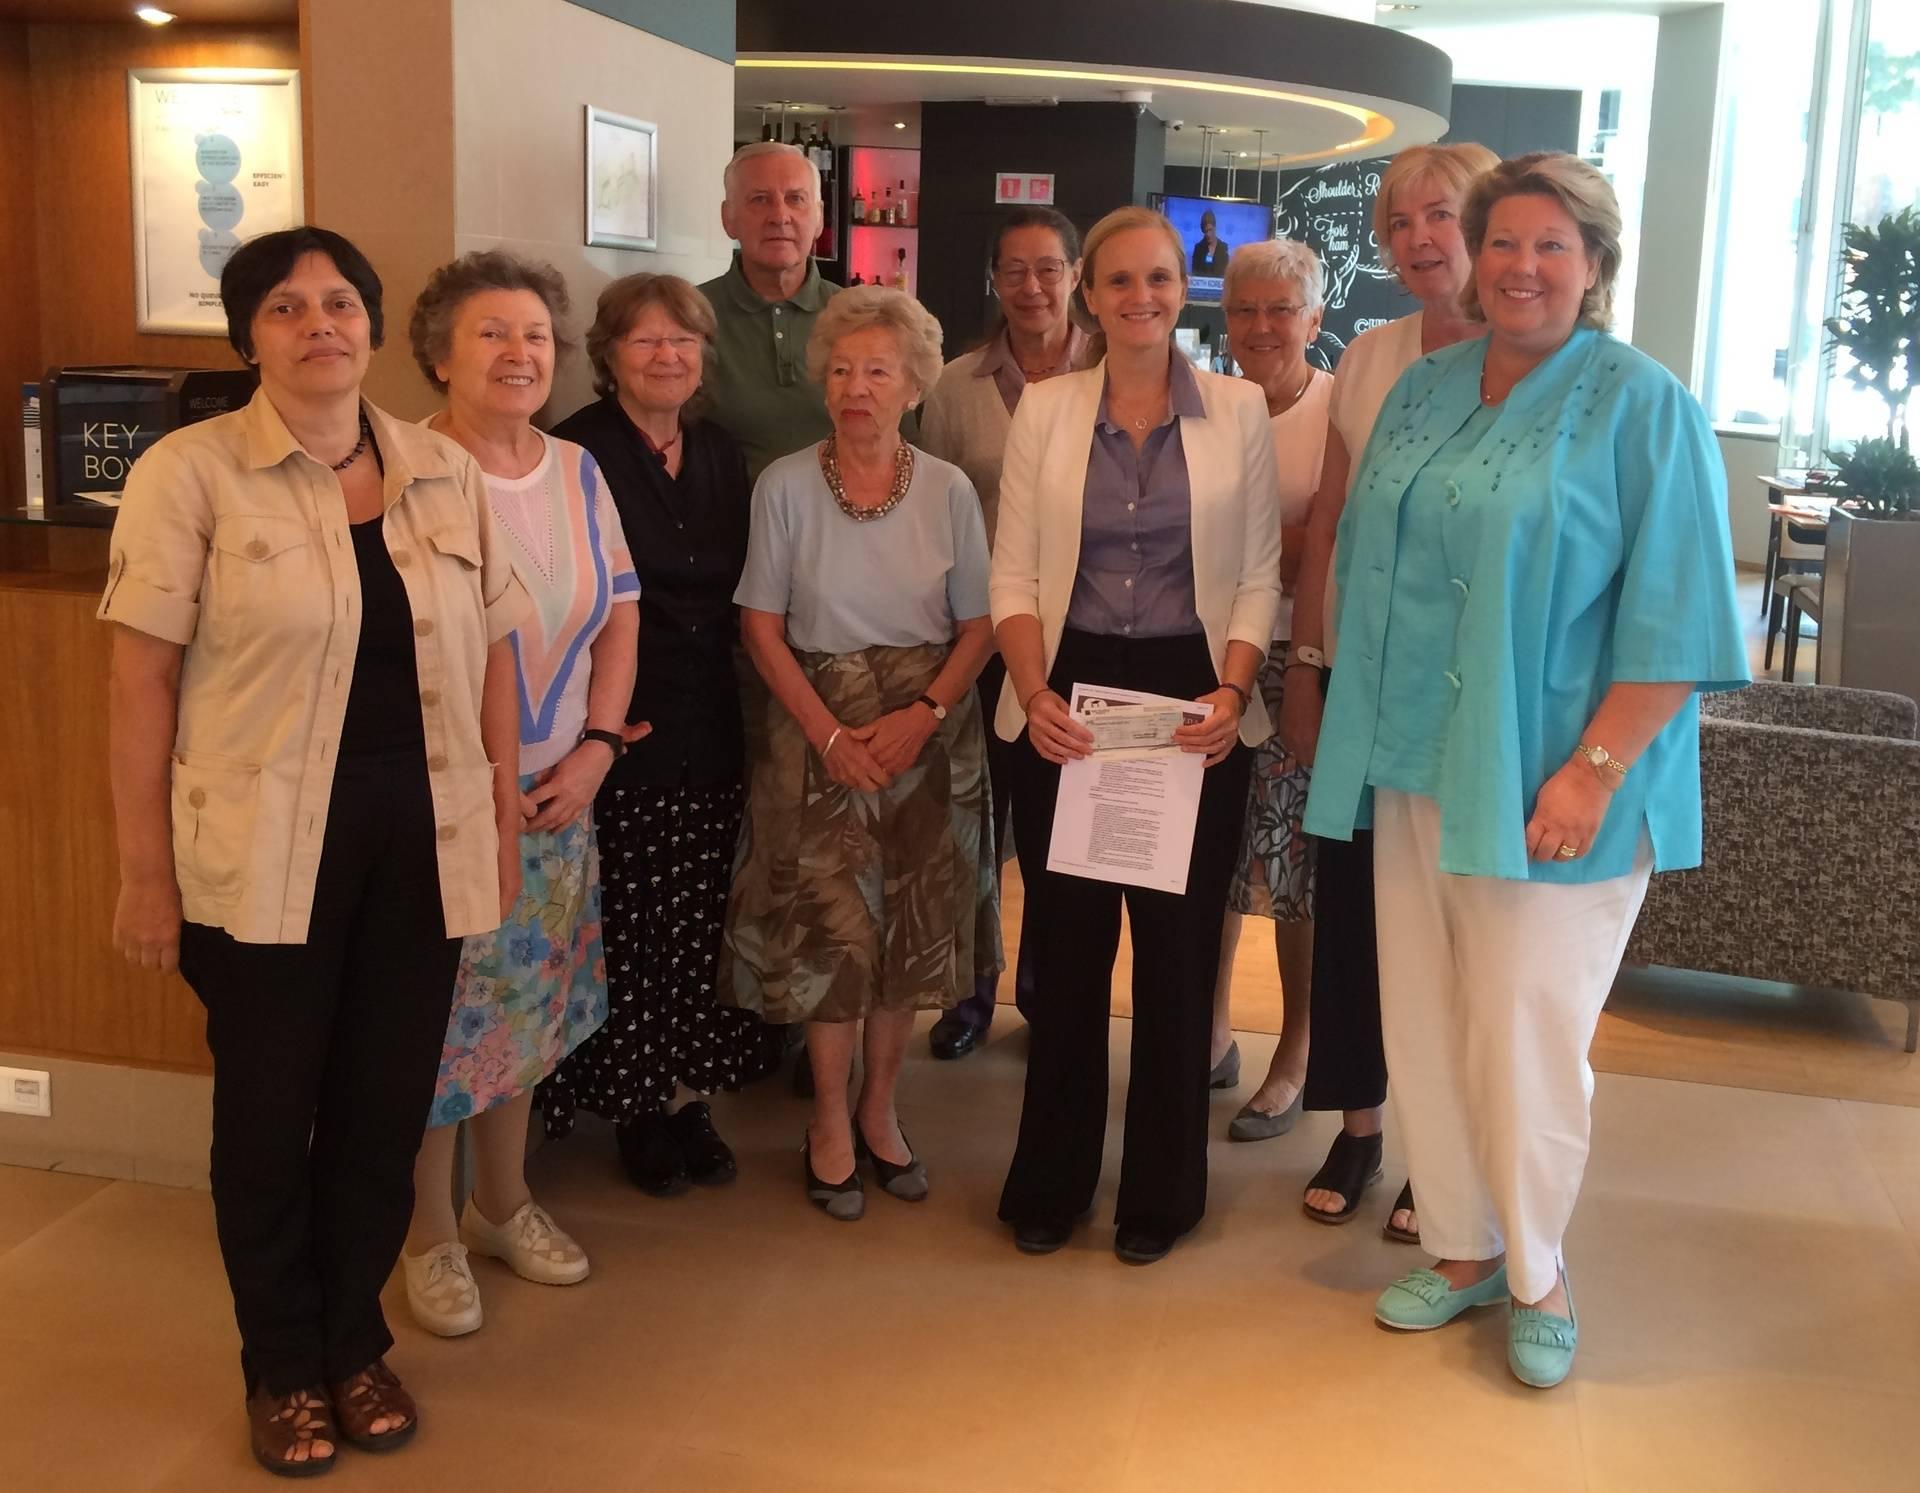 Fany Brotcorne received a Marie Derscheid-Delcourt research grant